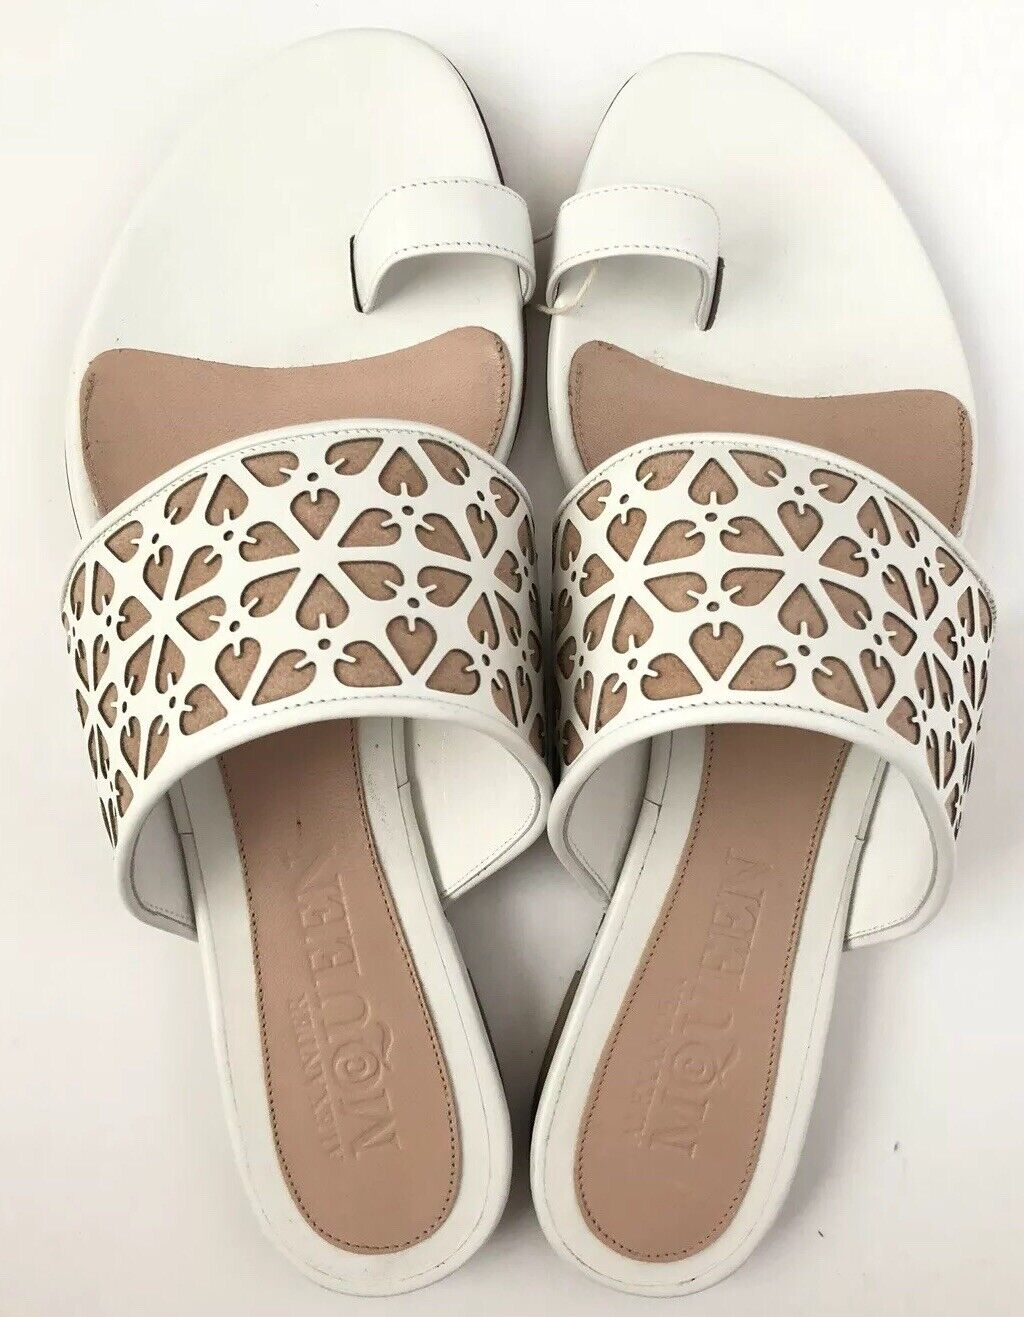 Alexander McQueen mujer zapatos Talla 40 NIB blanco Flats Sandals Leather